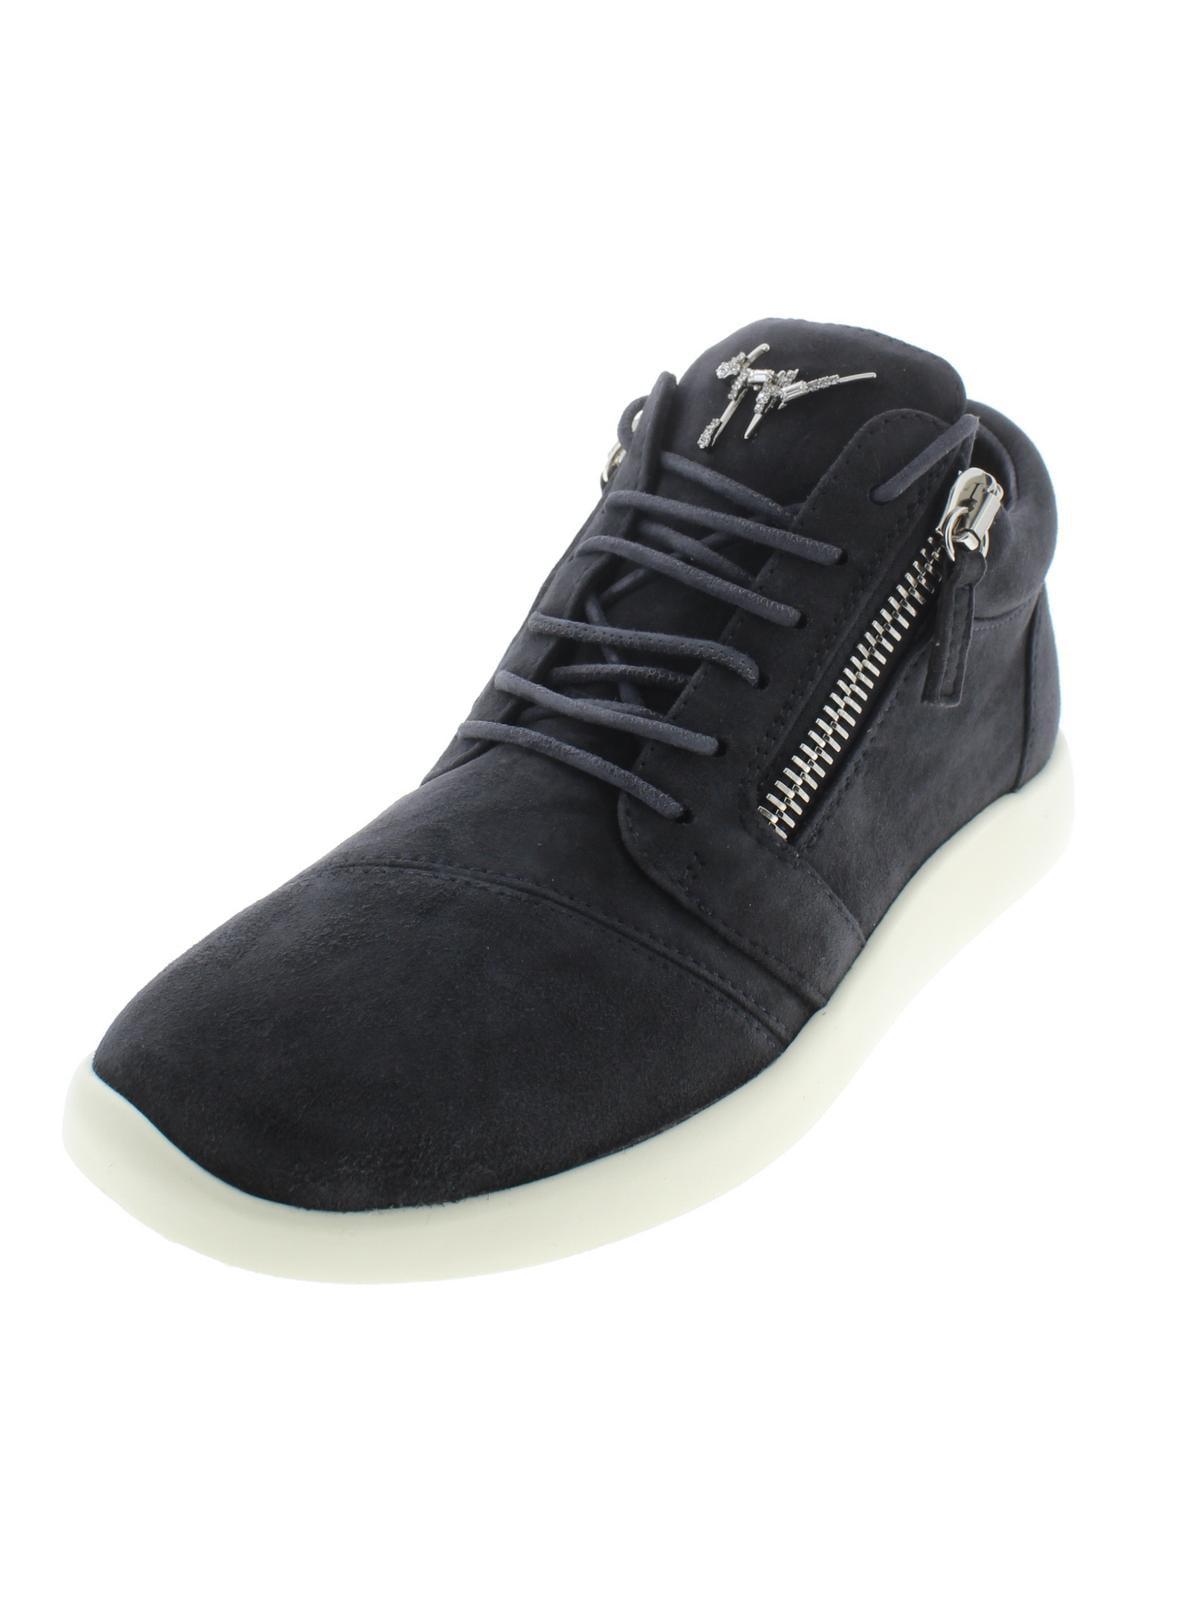 78652ba67f987 Giuseppe Zanotti - Giuseppe Zanotti Womens Singleg SC Donna Suede Zipper Fashion  Sneakers - Walmart.com